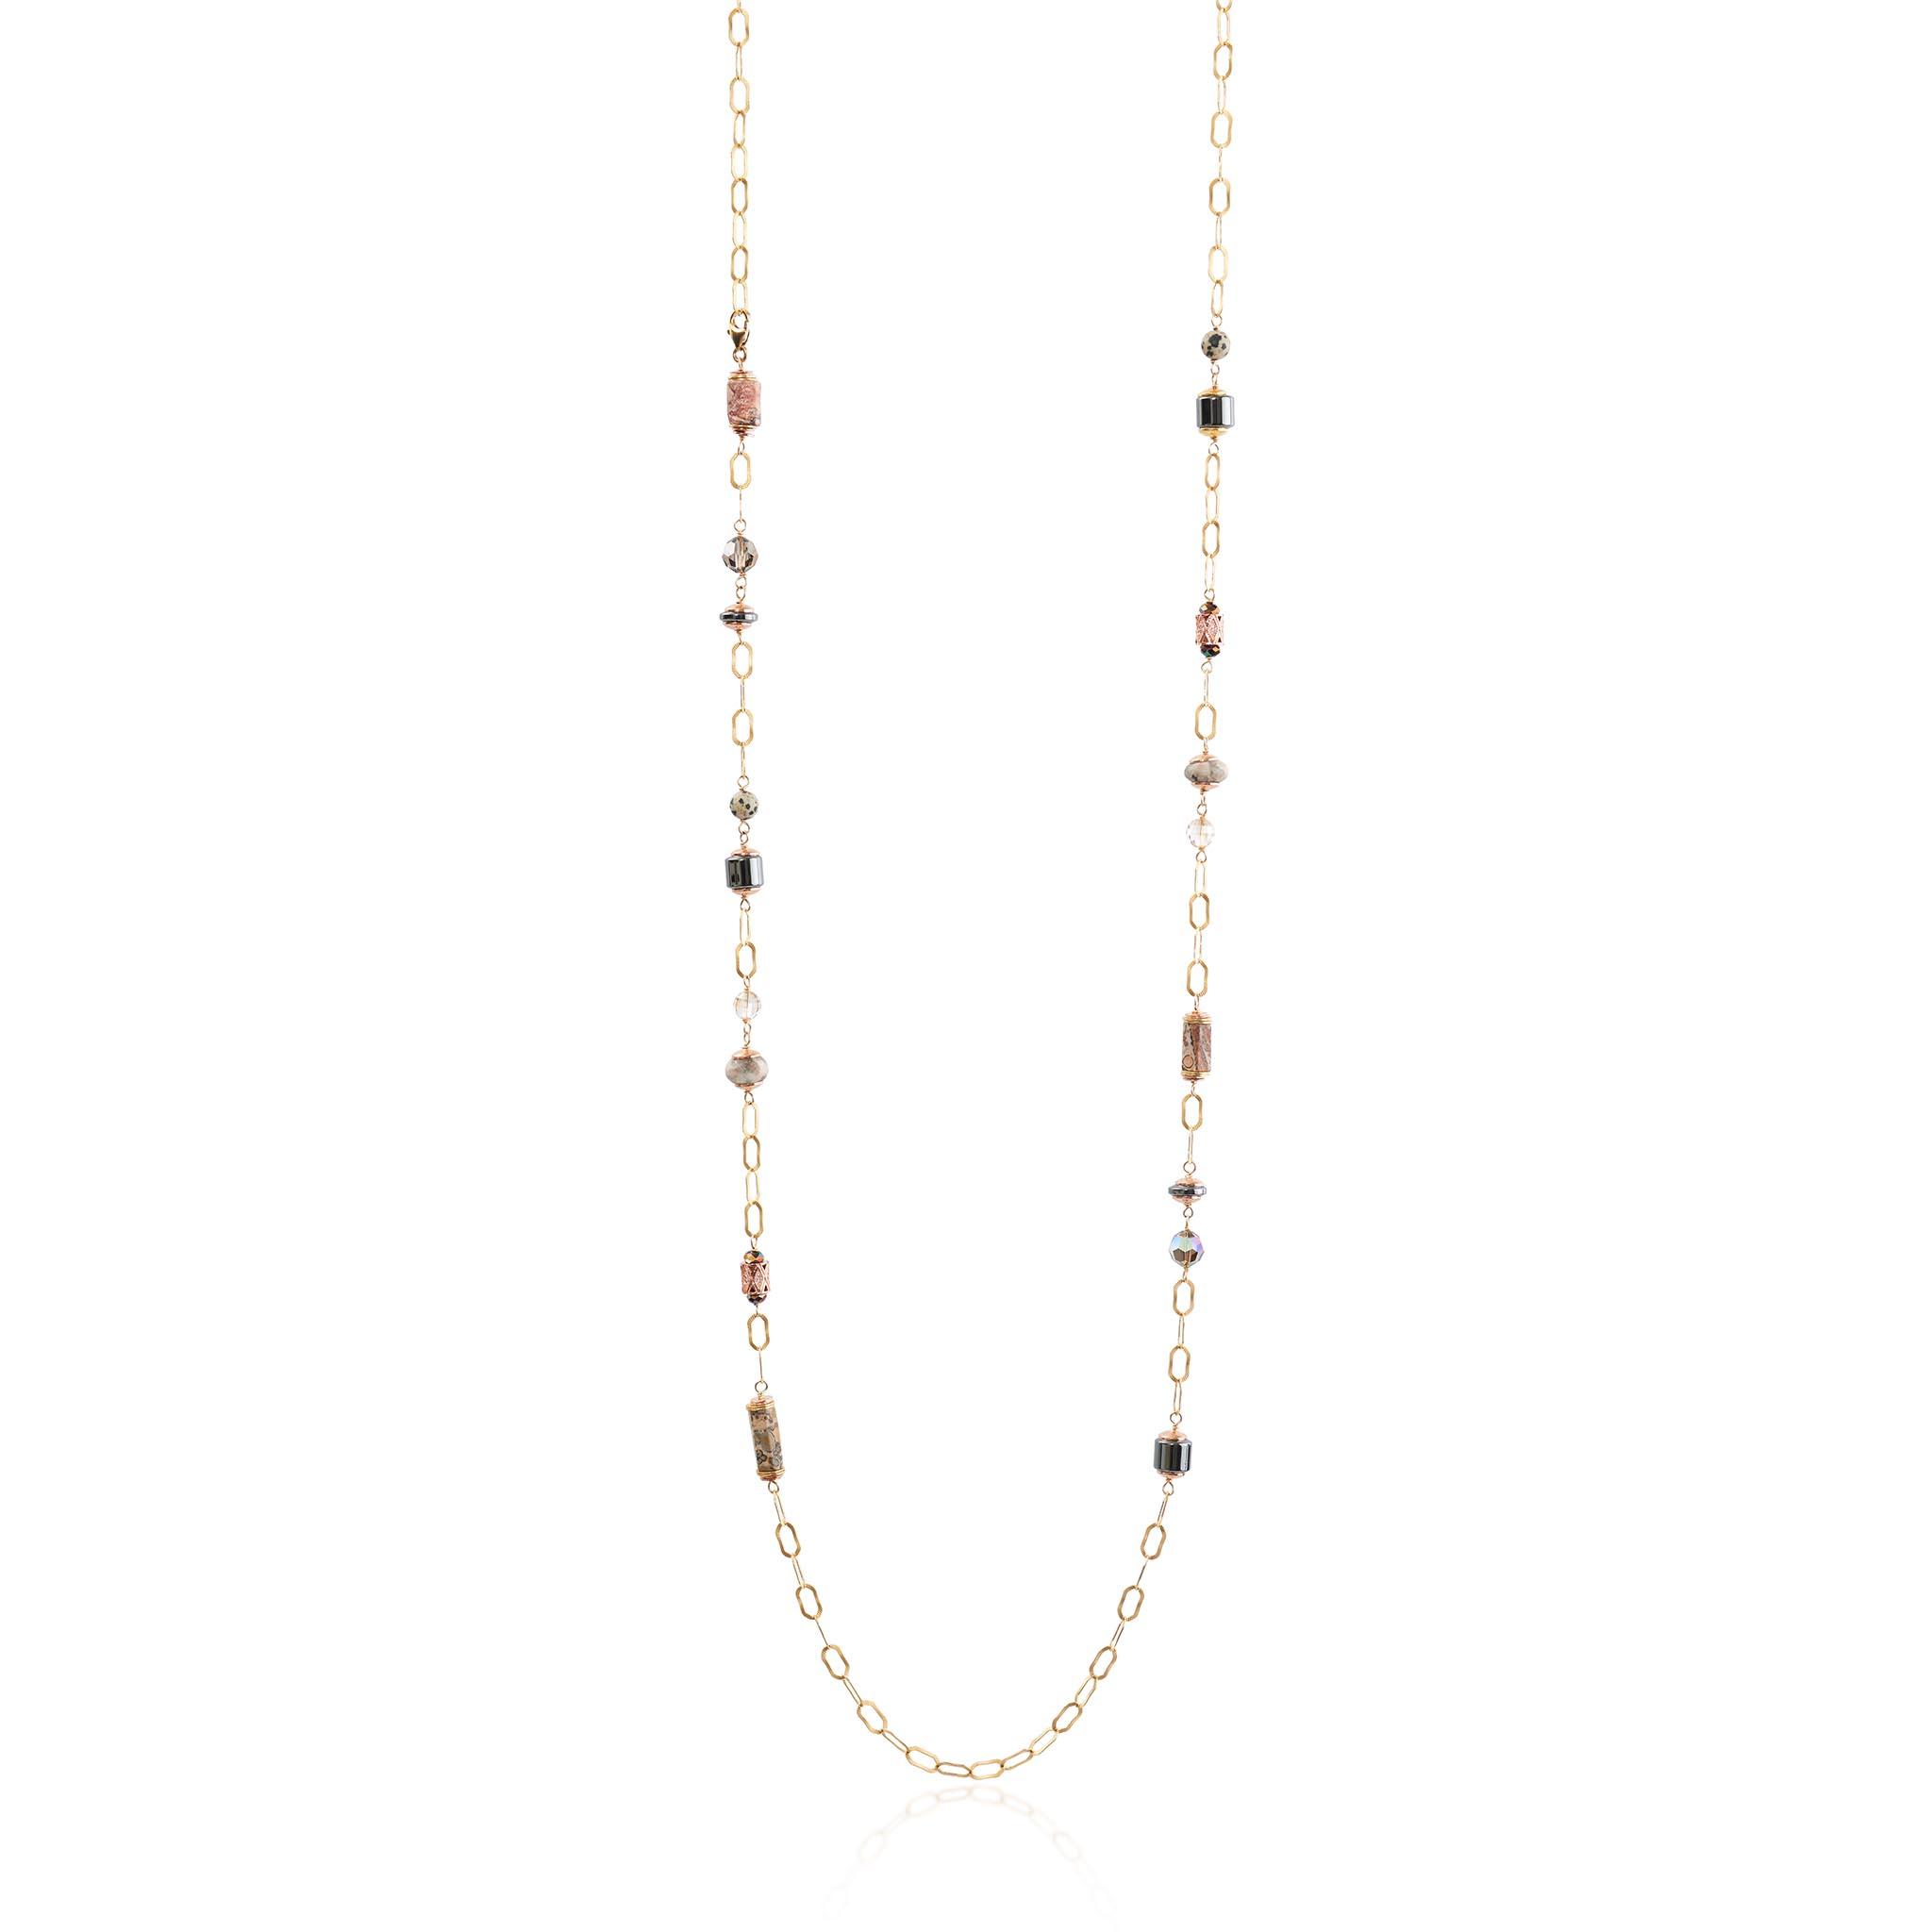 Acadia Necklace Long – Hillberg & Berk